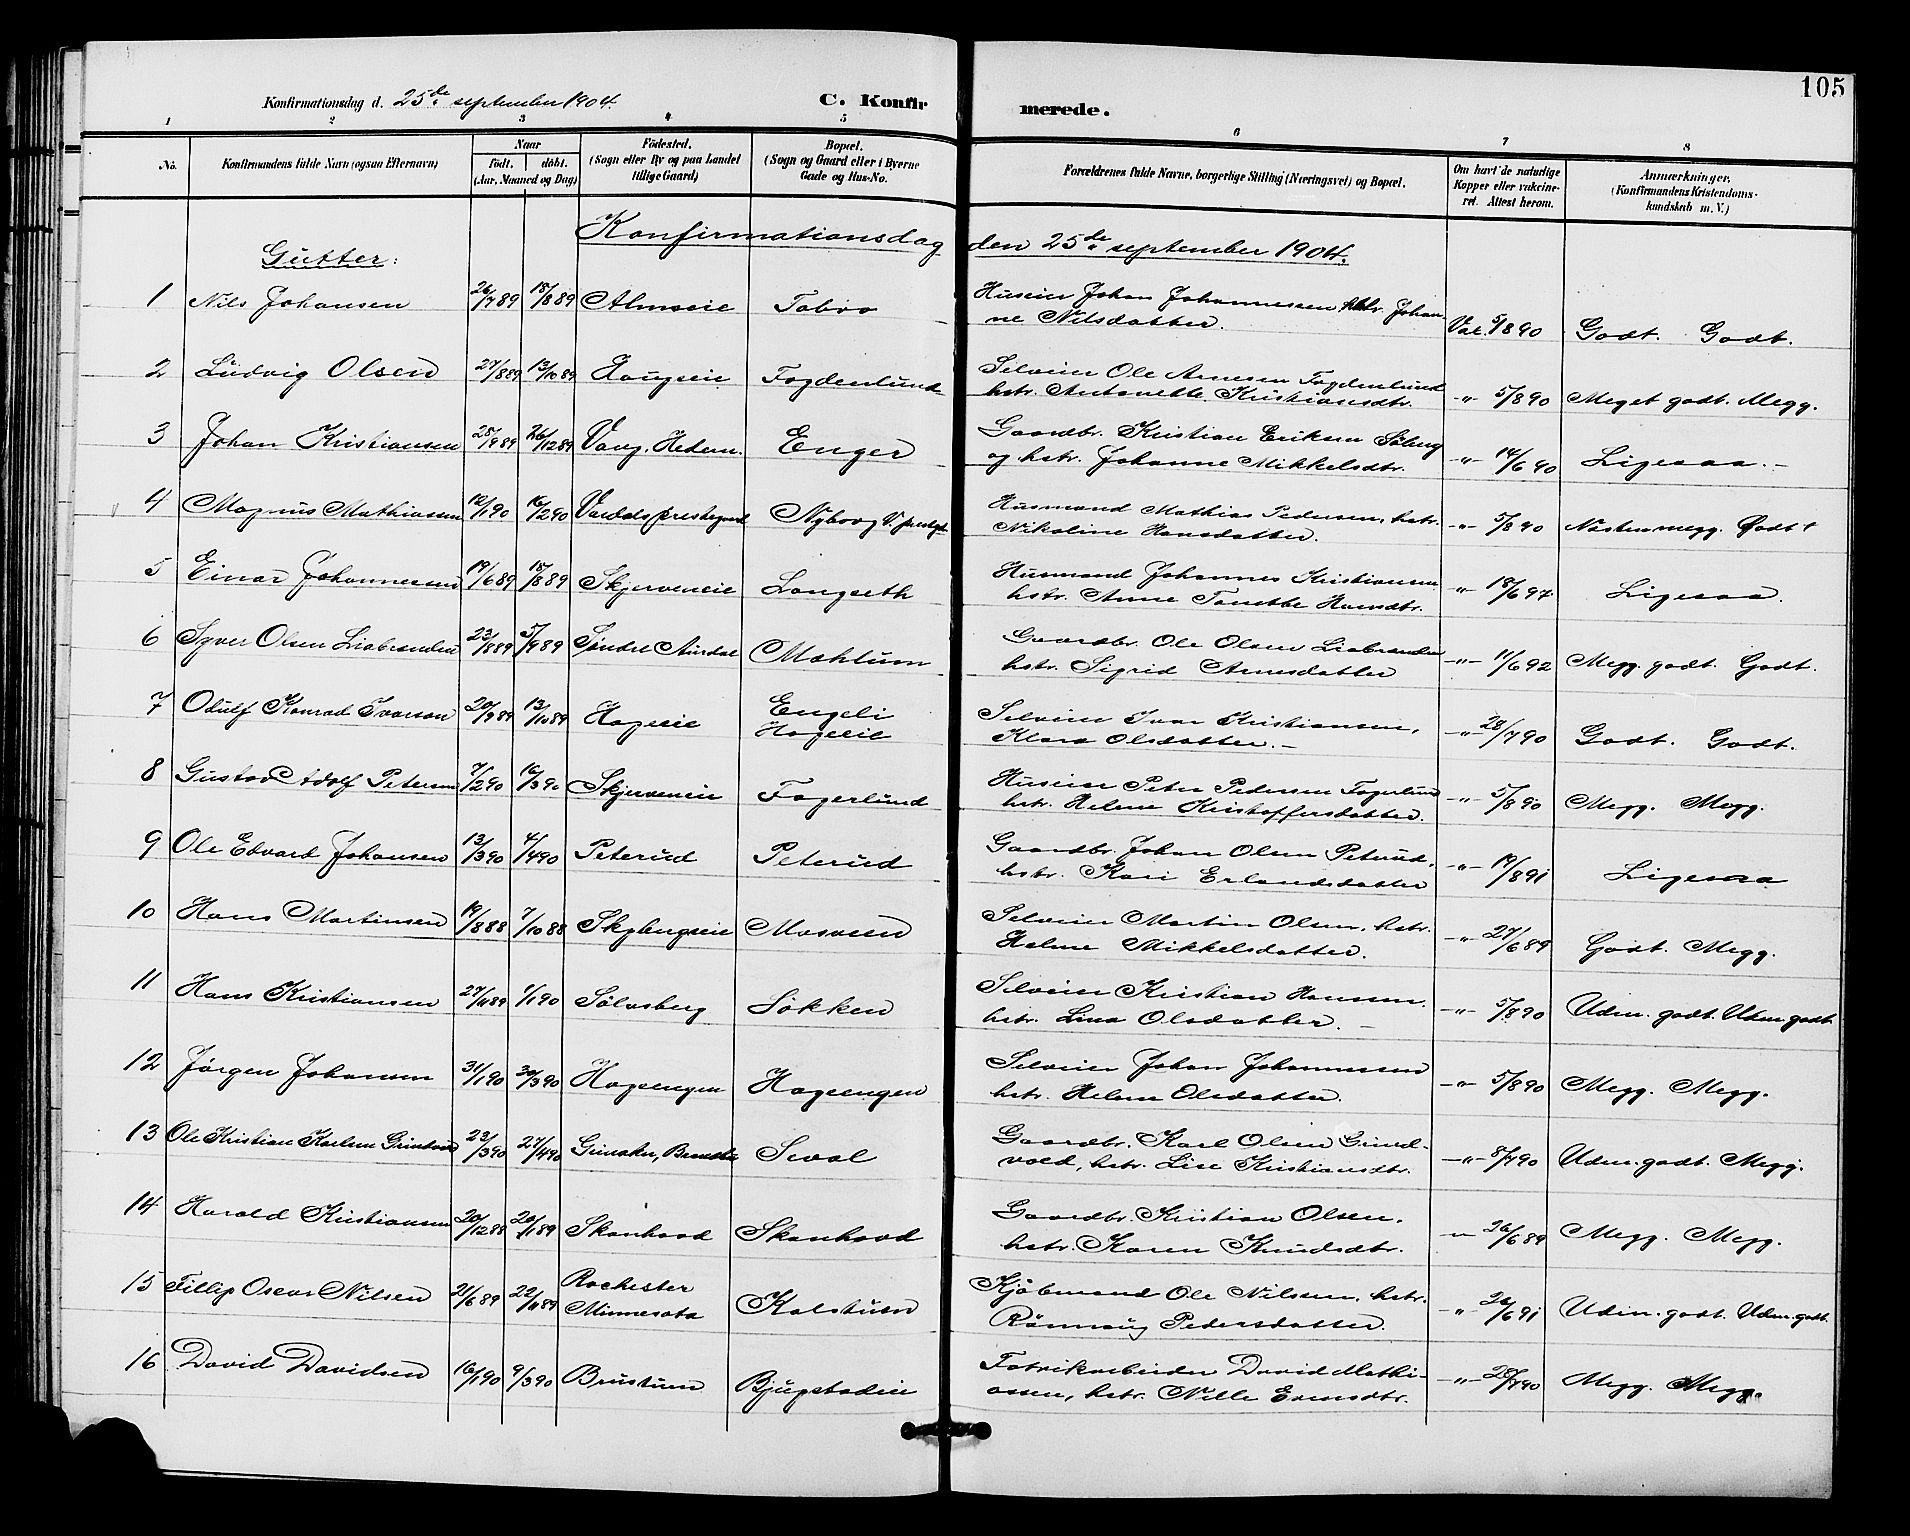 SAH, Vardal prestekontor, H/Ha/Hab/L0011: Klokkerbok nr. 11, 1899-1913, s. 105